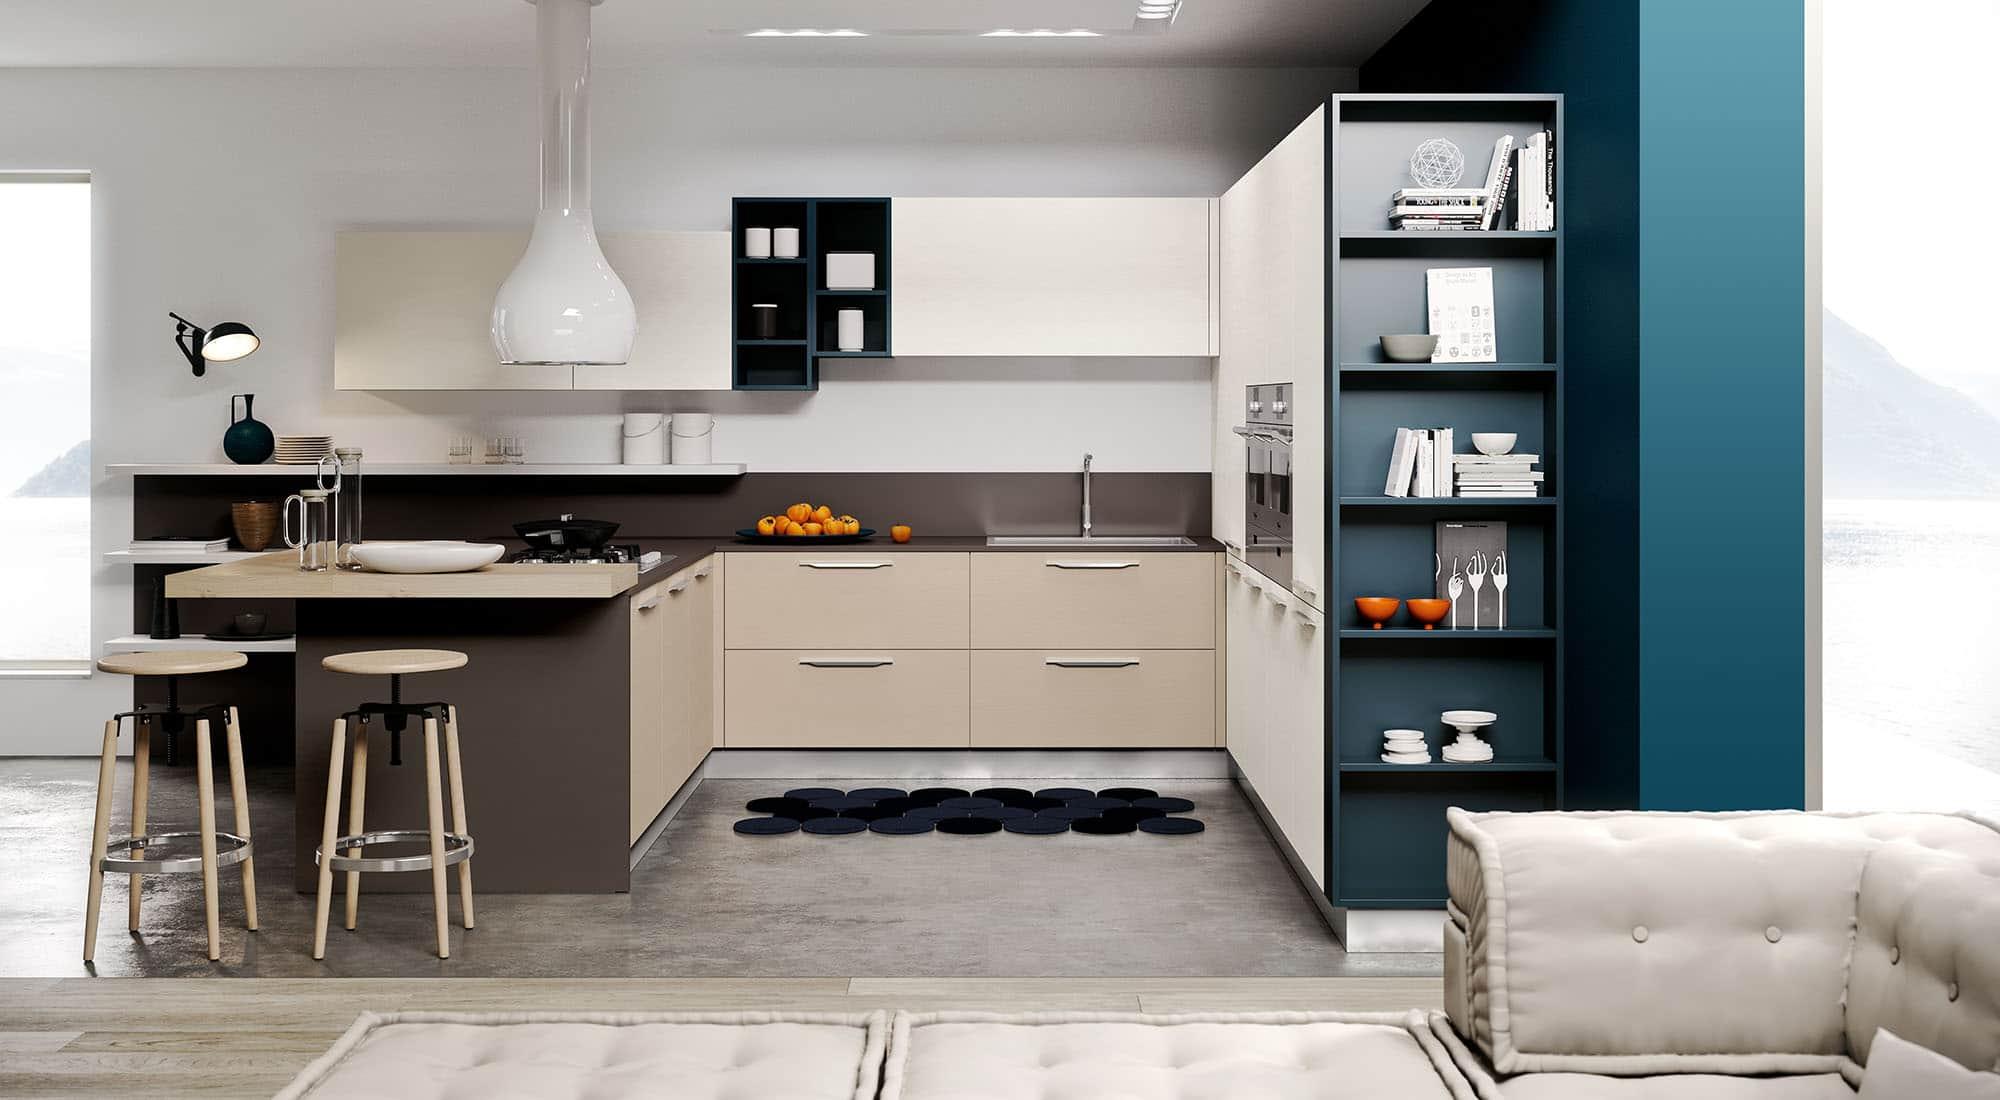 Vendita cucine padova negozio di arredamento cucine for Cucina moderna classica